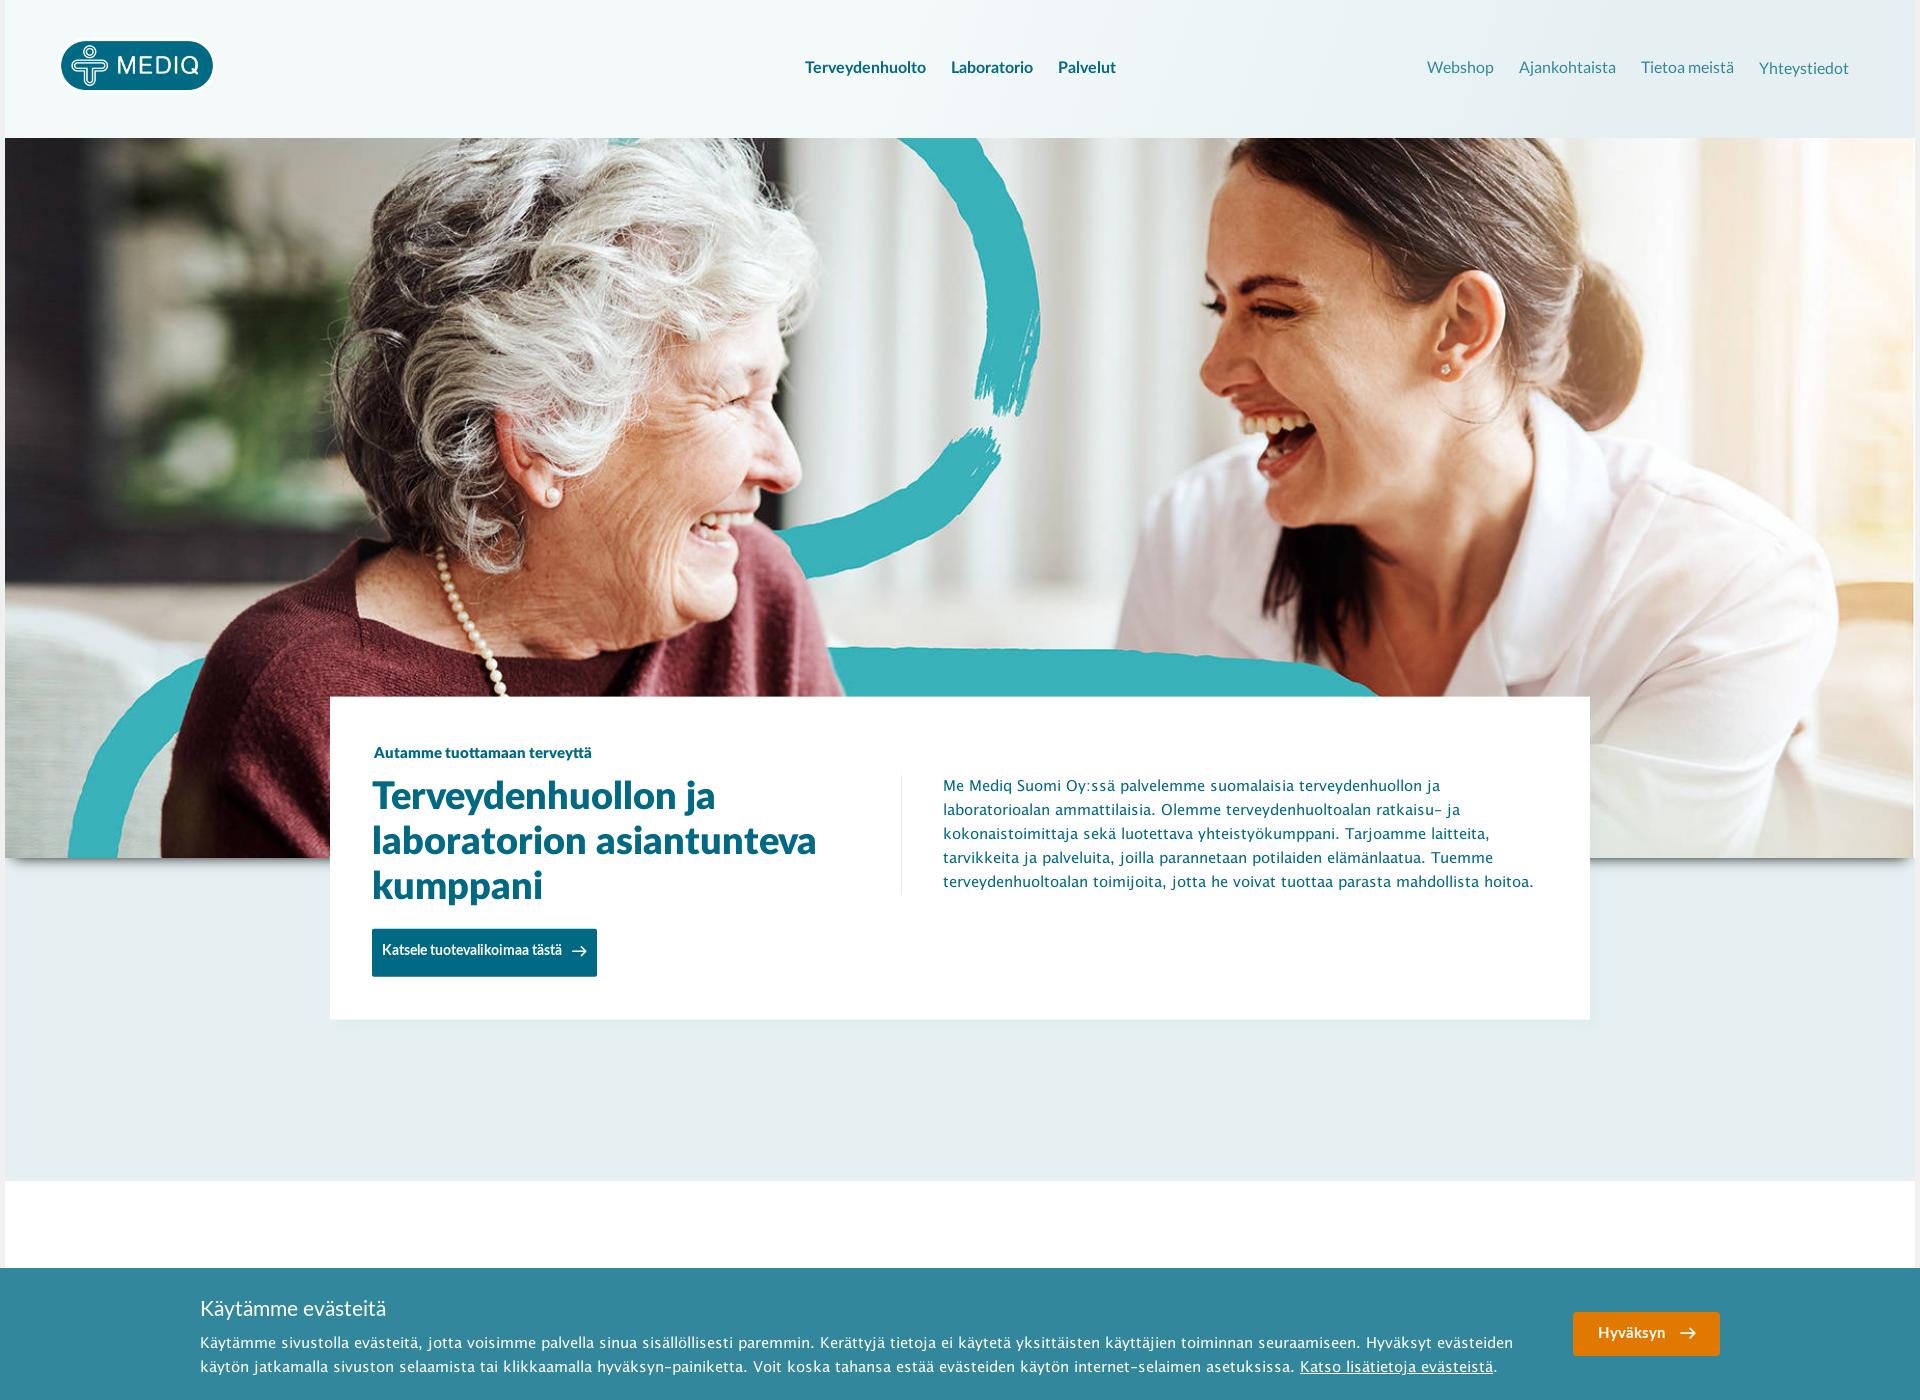 Screenshot for mediq.fi